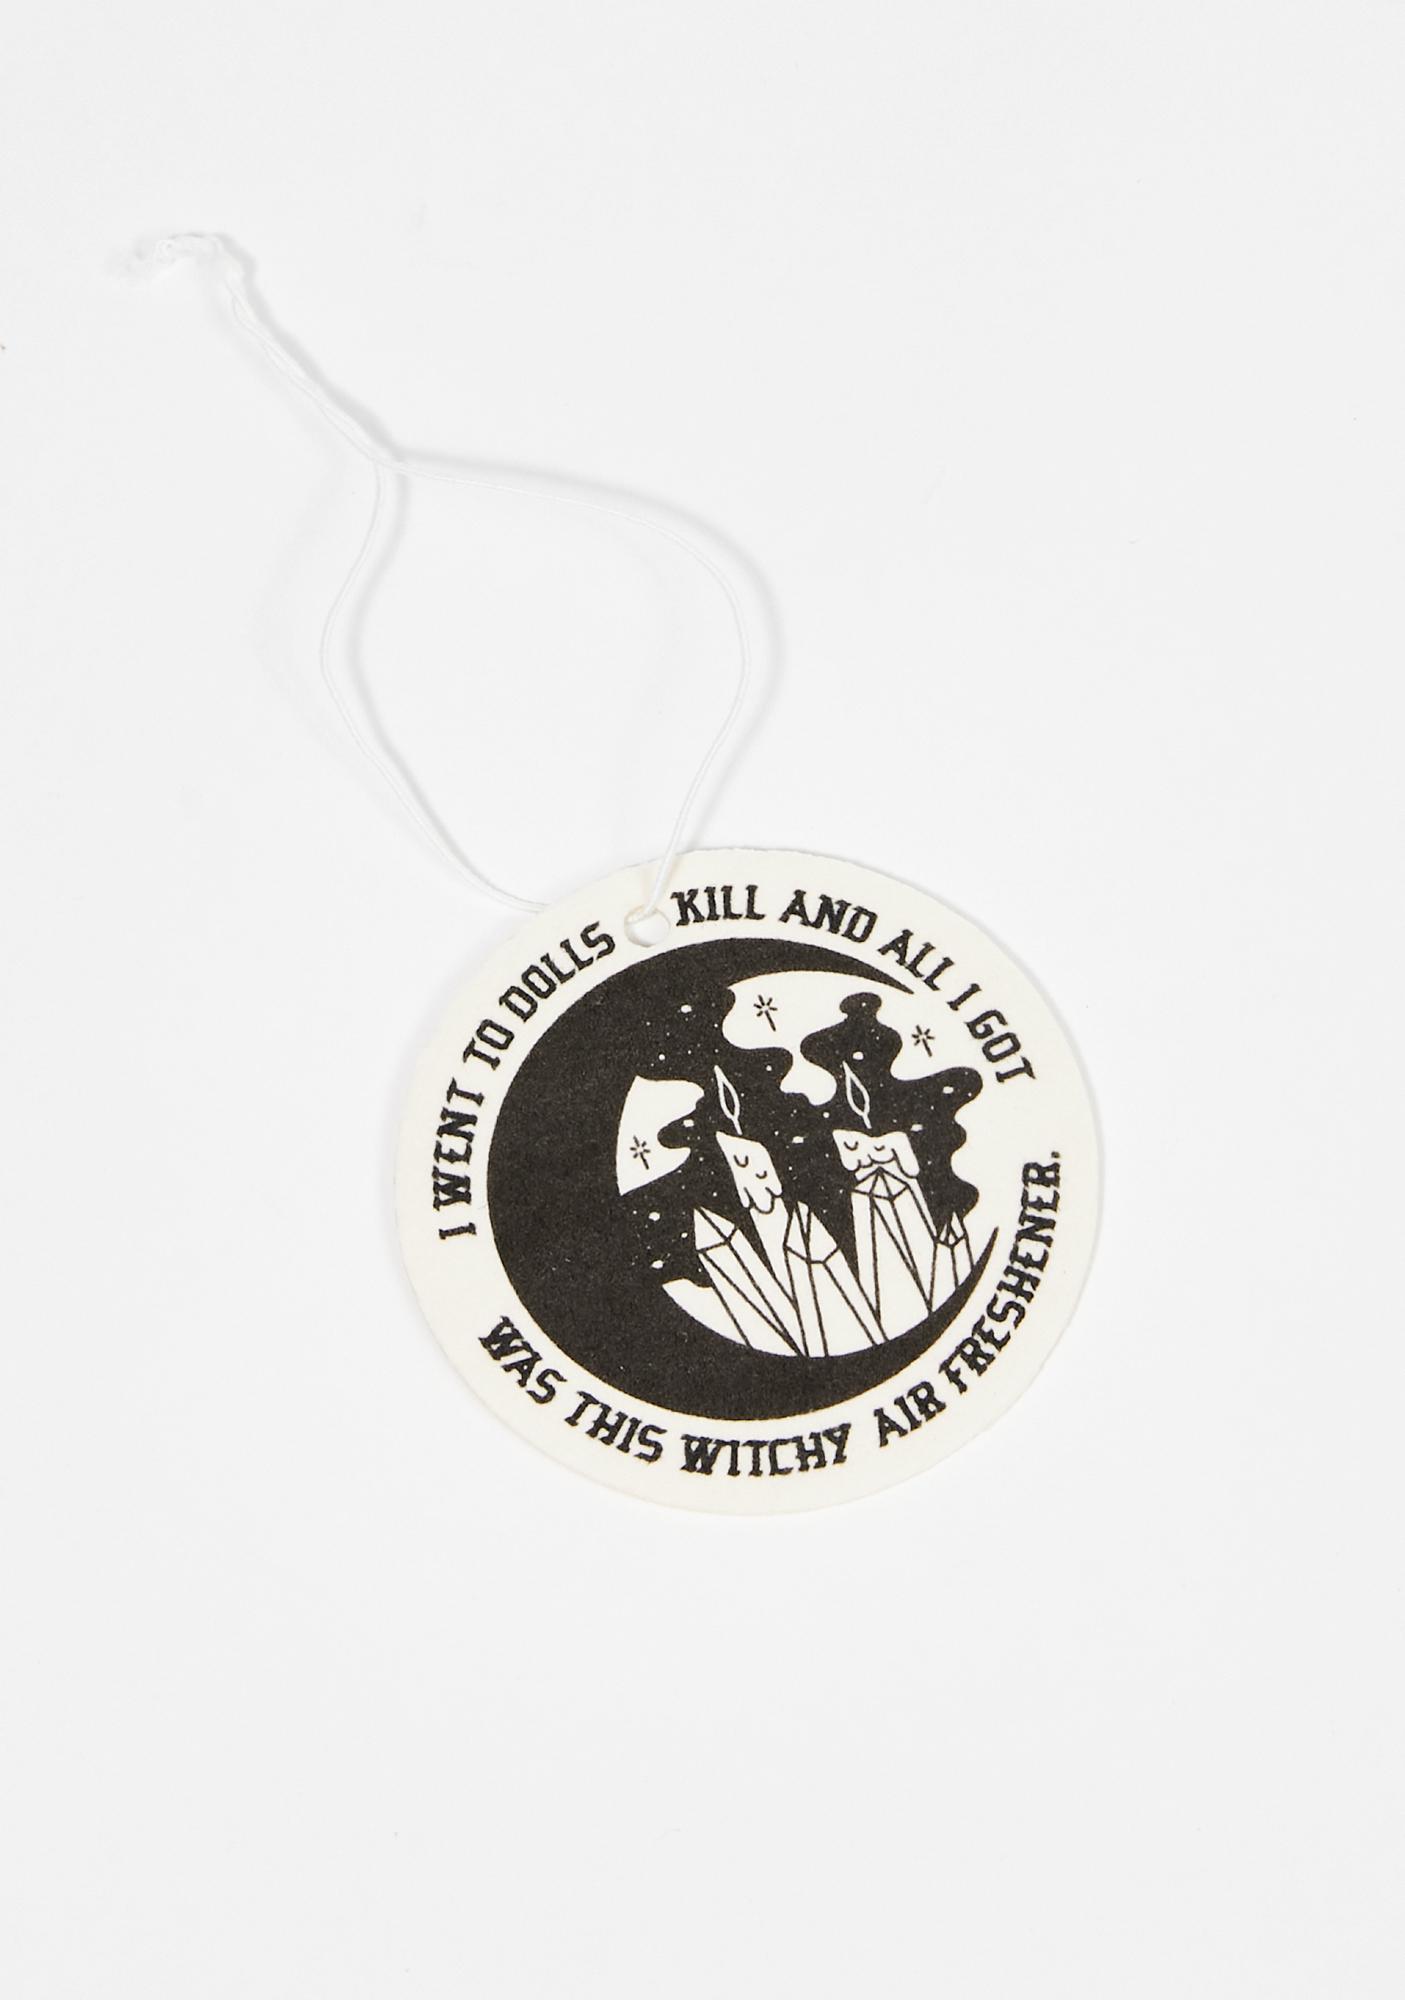 Basic Witch Air Freshener